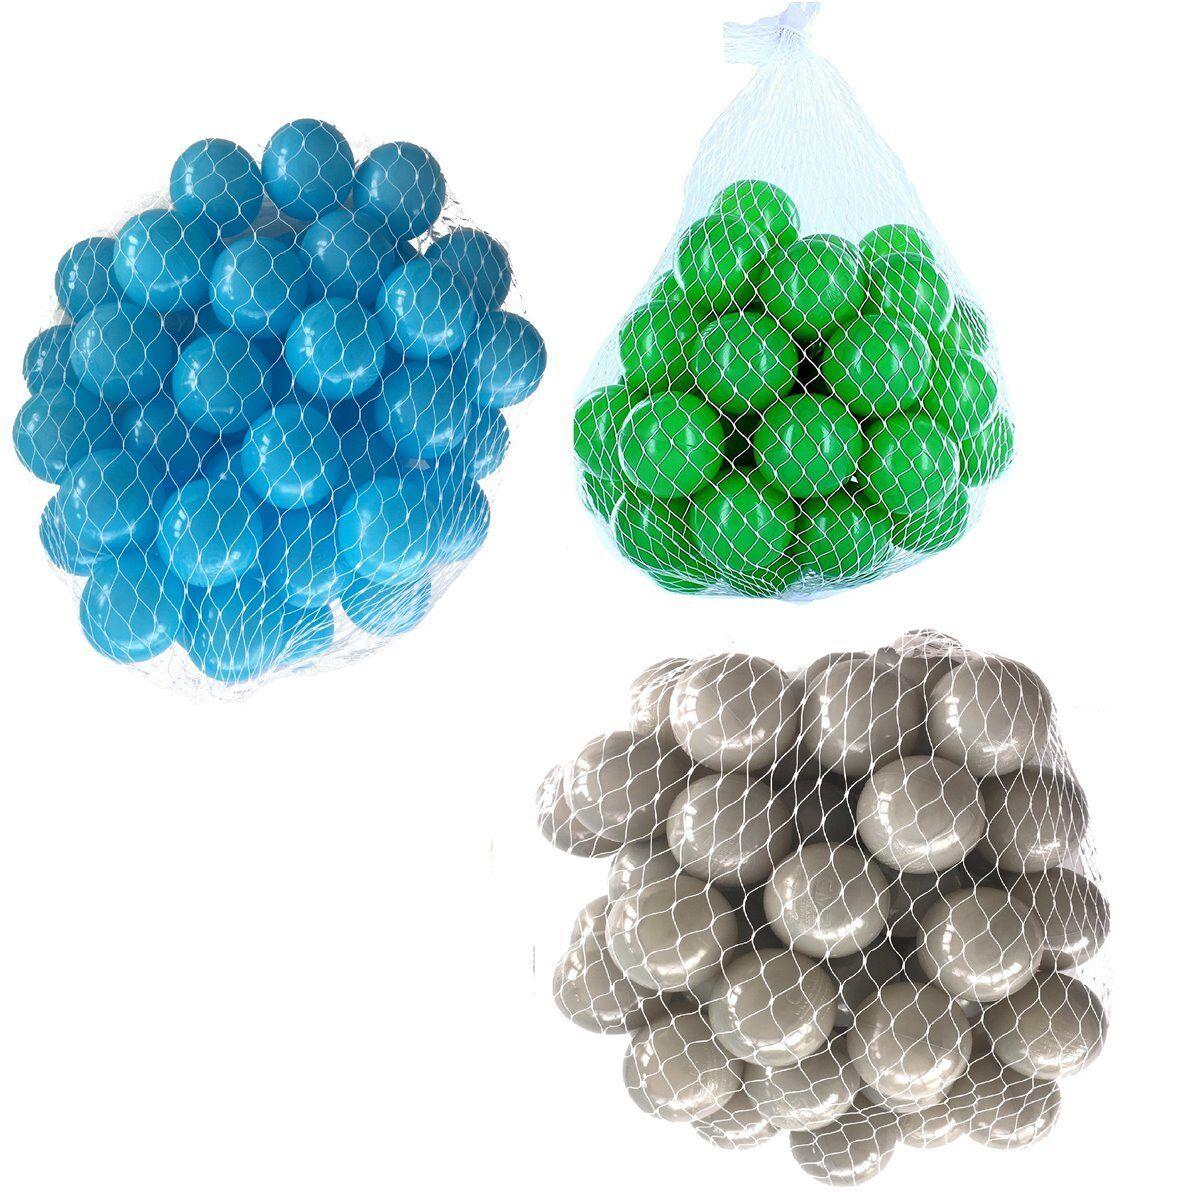 150-9000 Bällebad Bälle 55mm mix türkis grau grün gemischt Farben Baby Kind Ball